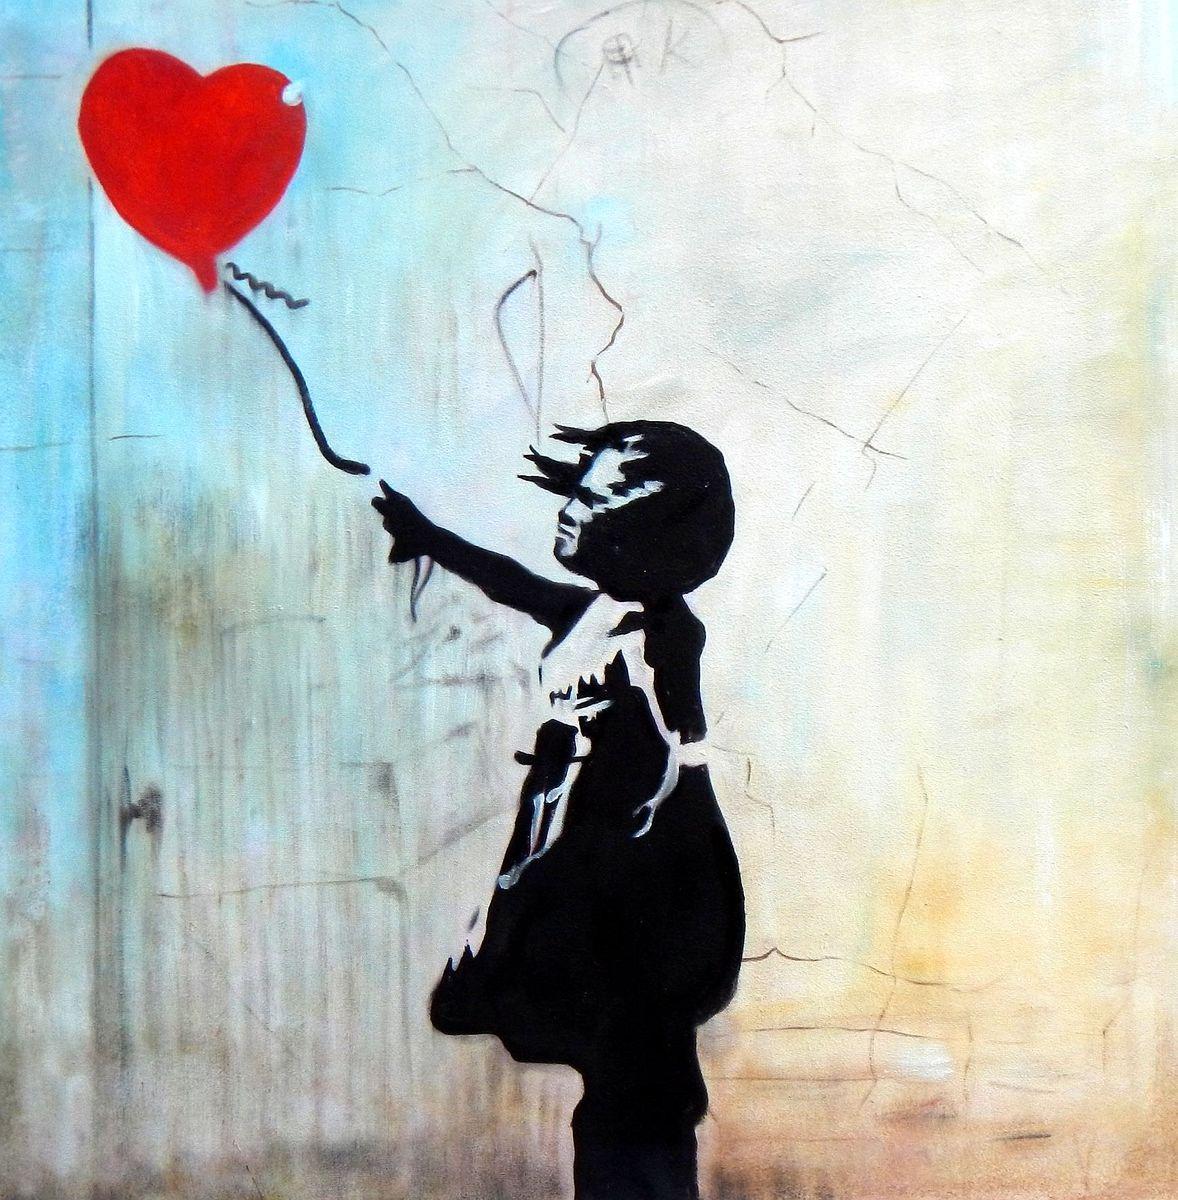 Homage to Banksy - Girl with balloon e93083 60x60cm exquisites Ölgemälde